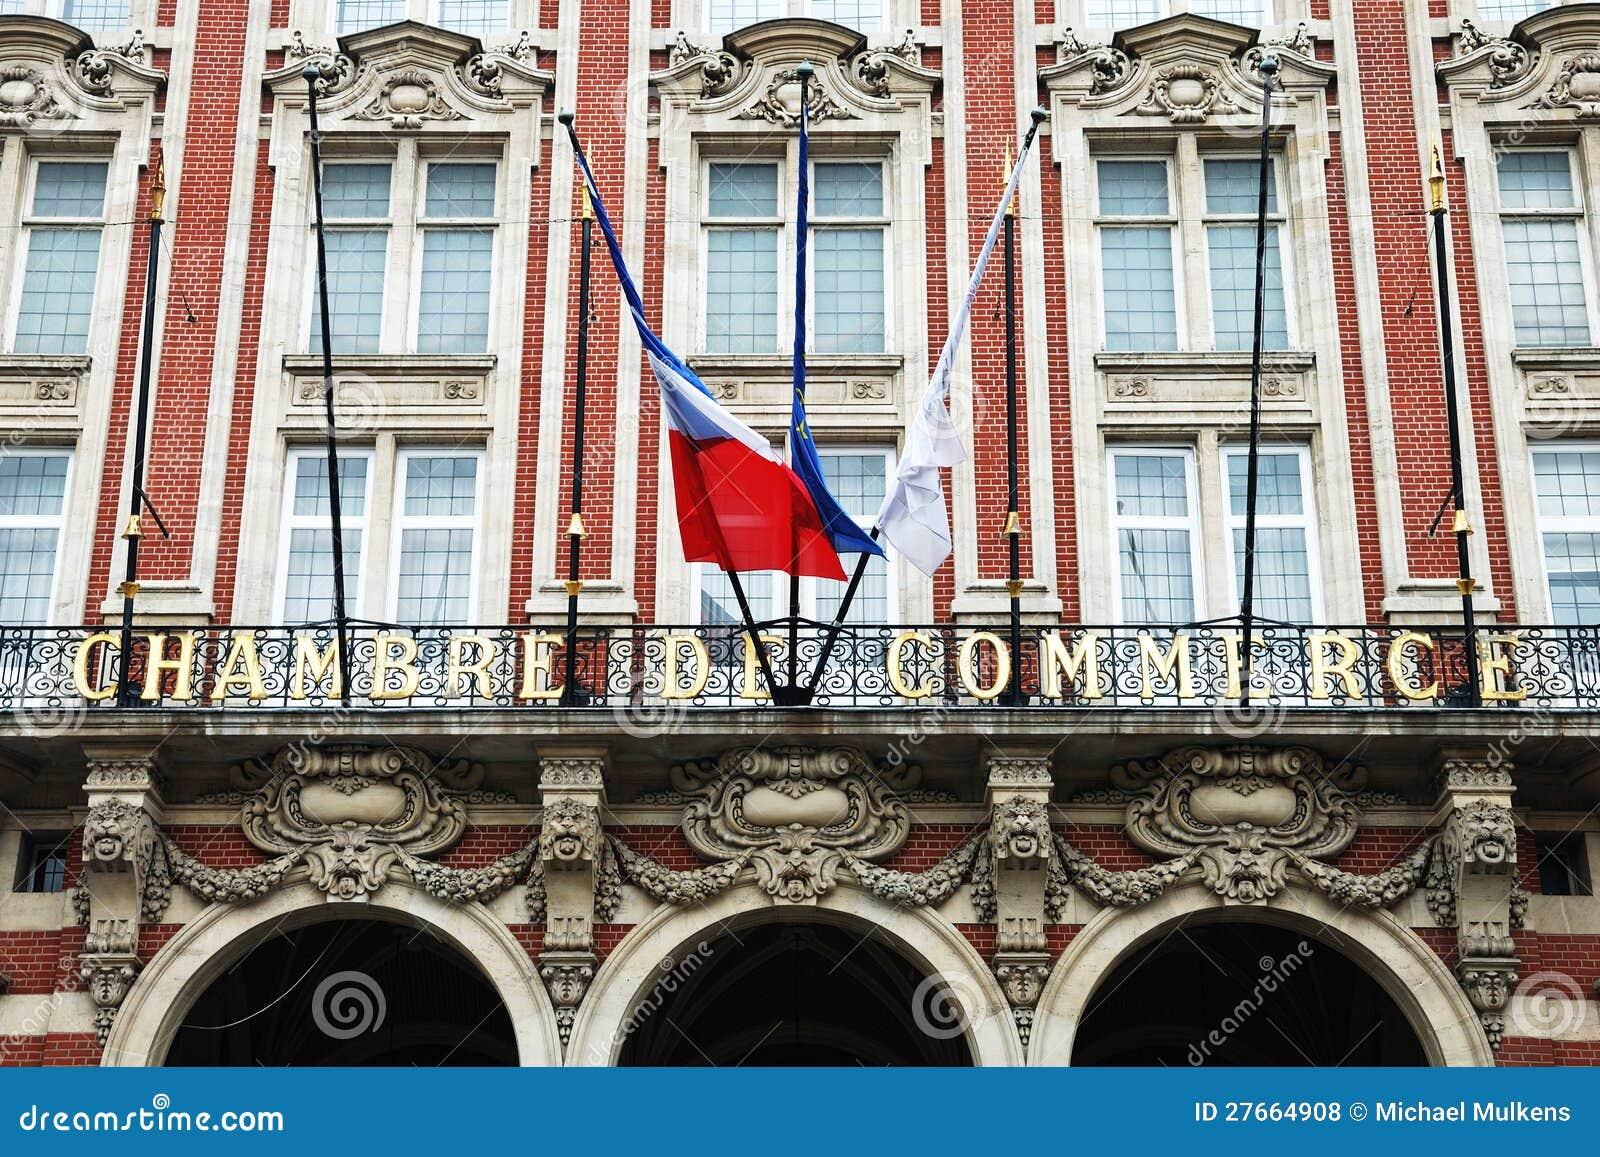 Chambre de commerce lille photo stock ditorial image du construction 27664908 - Chambre du commerce lille ...